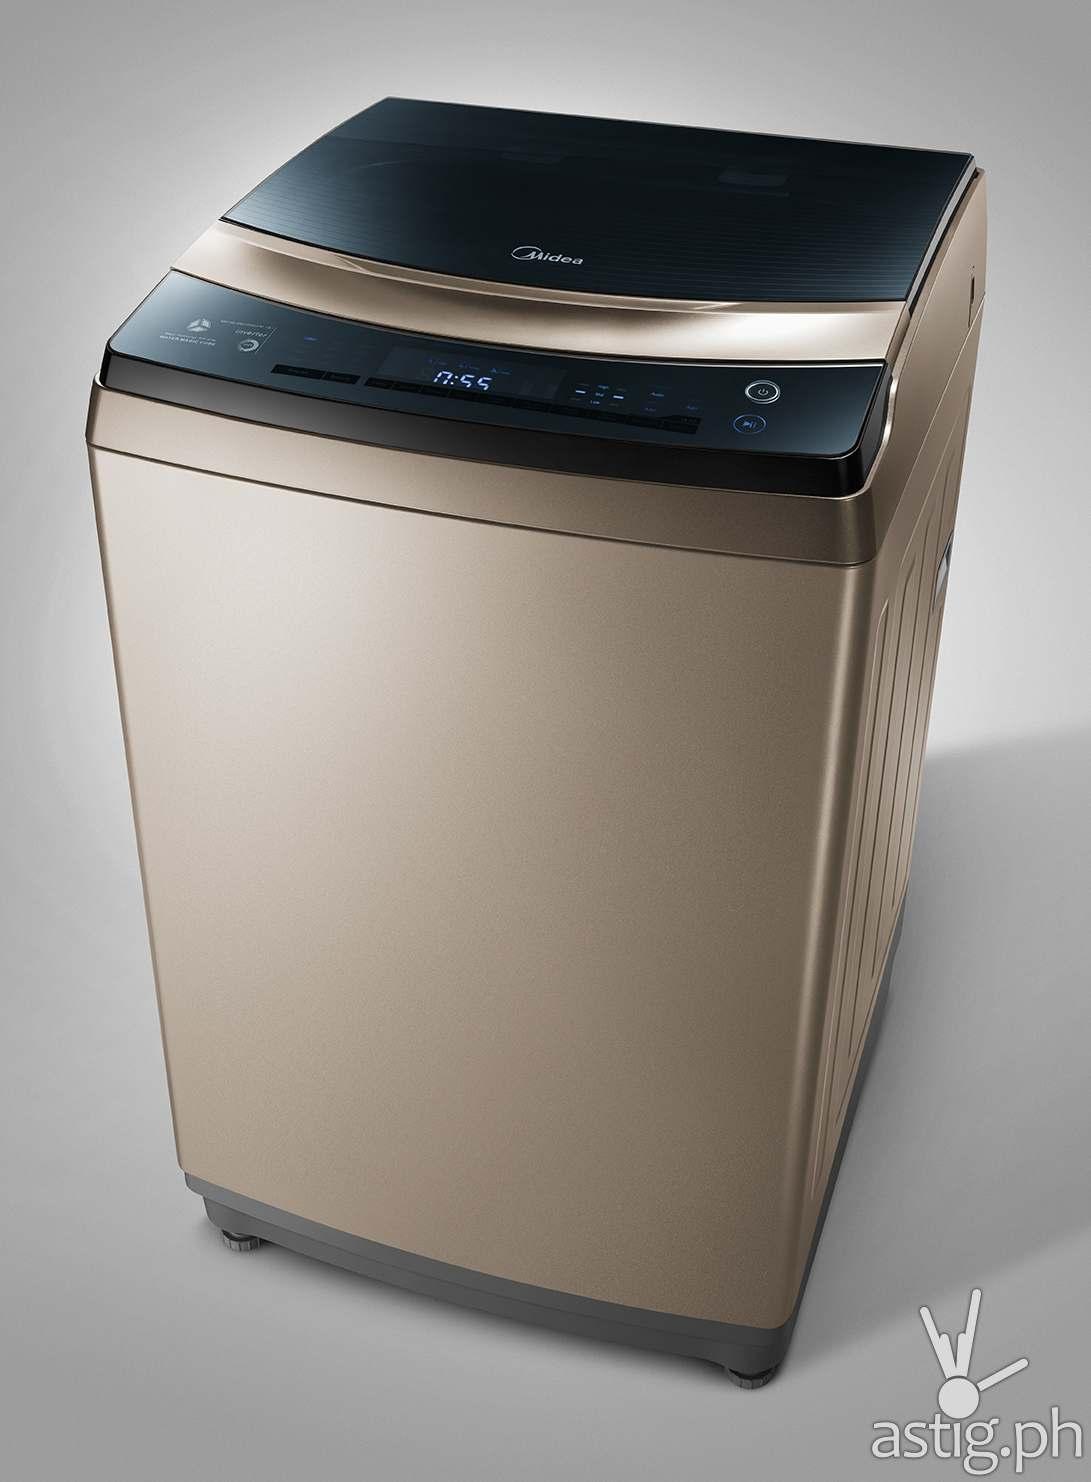 midea washing machine problems